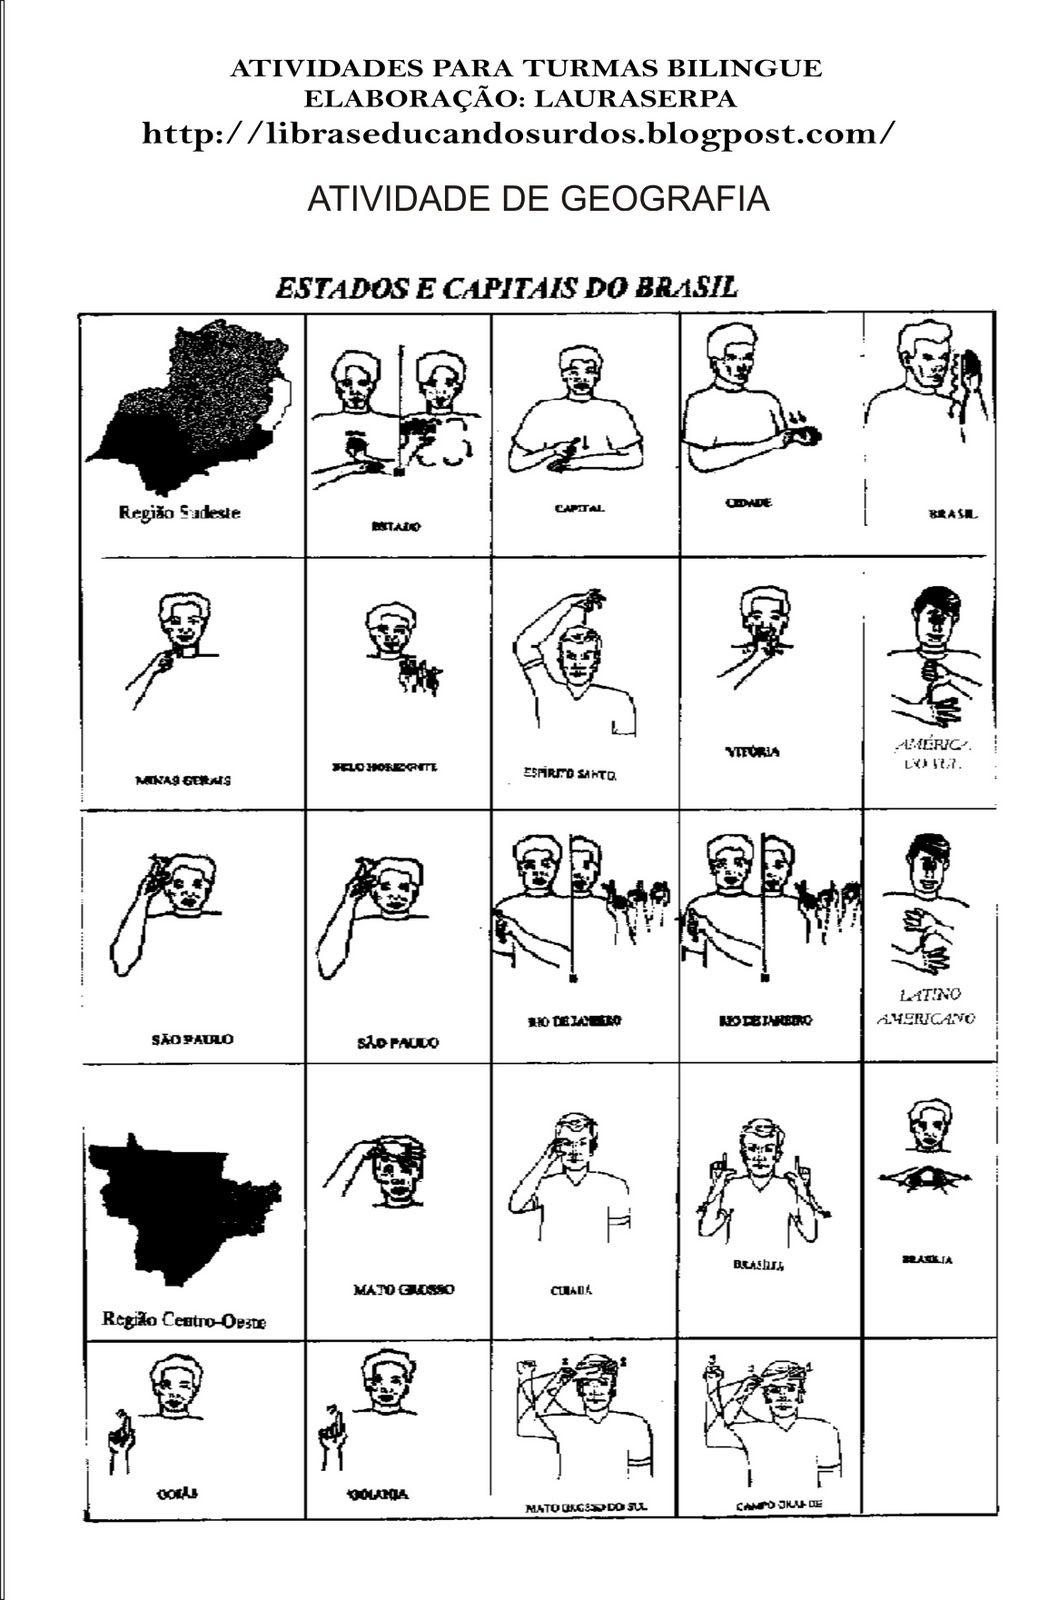 Muitas vezes LIBRAS: Educandos Surdos: Sinais dos Estados Brasileiros | LIBRAS  AU77